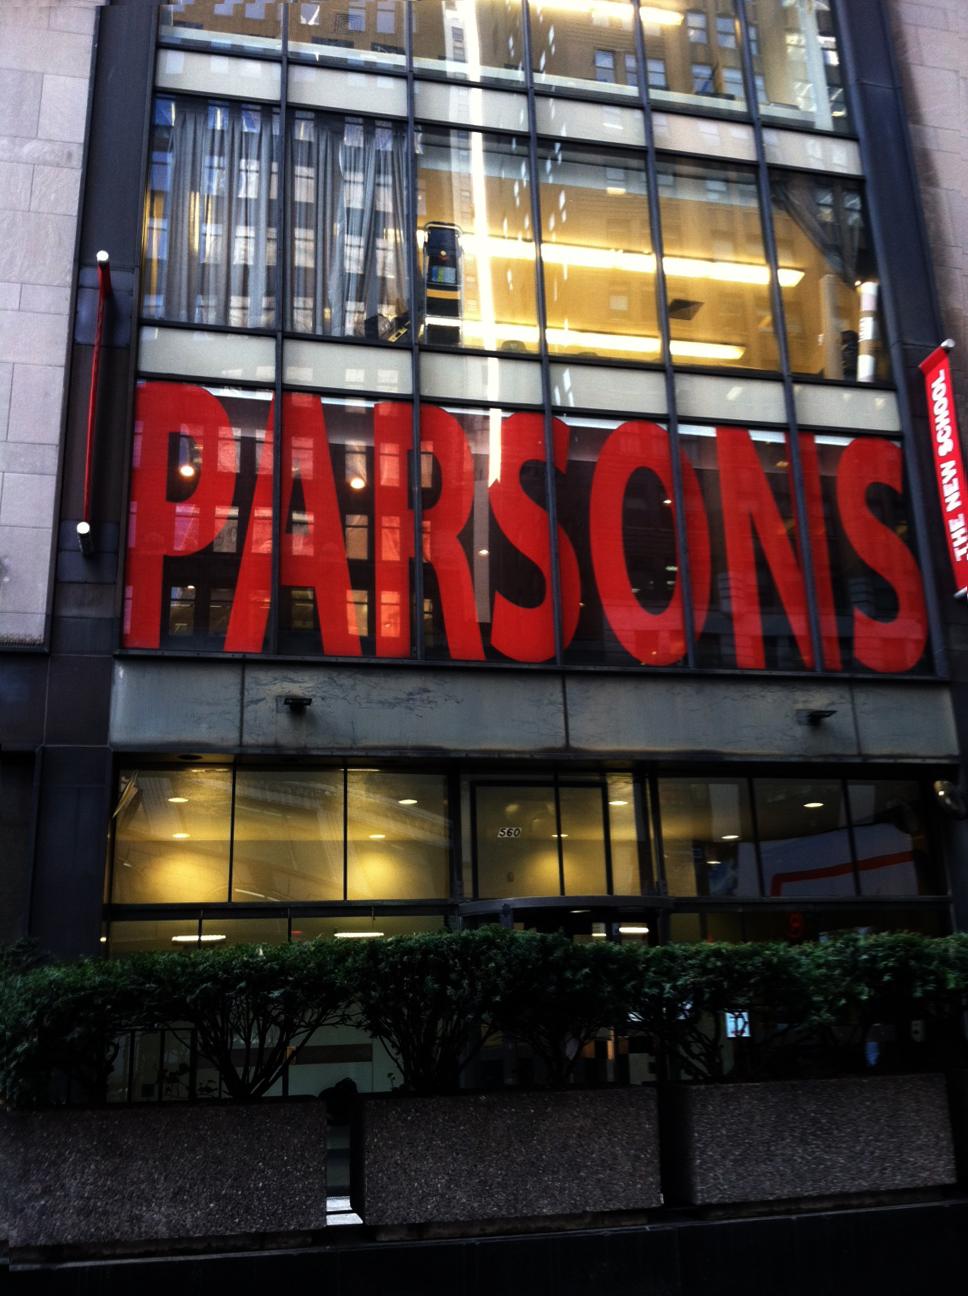 parsons.jpg